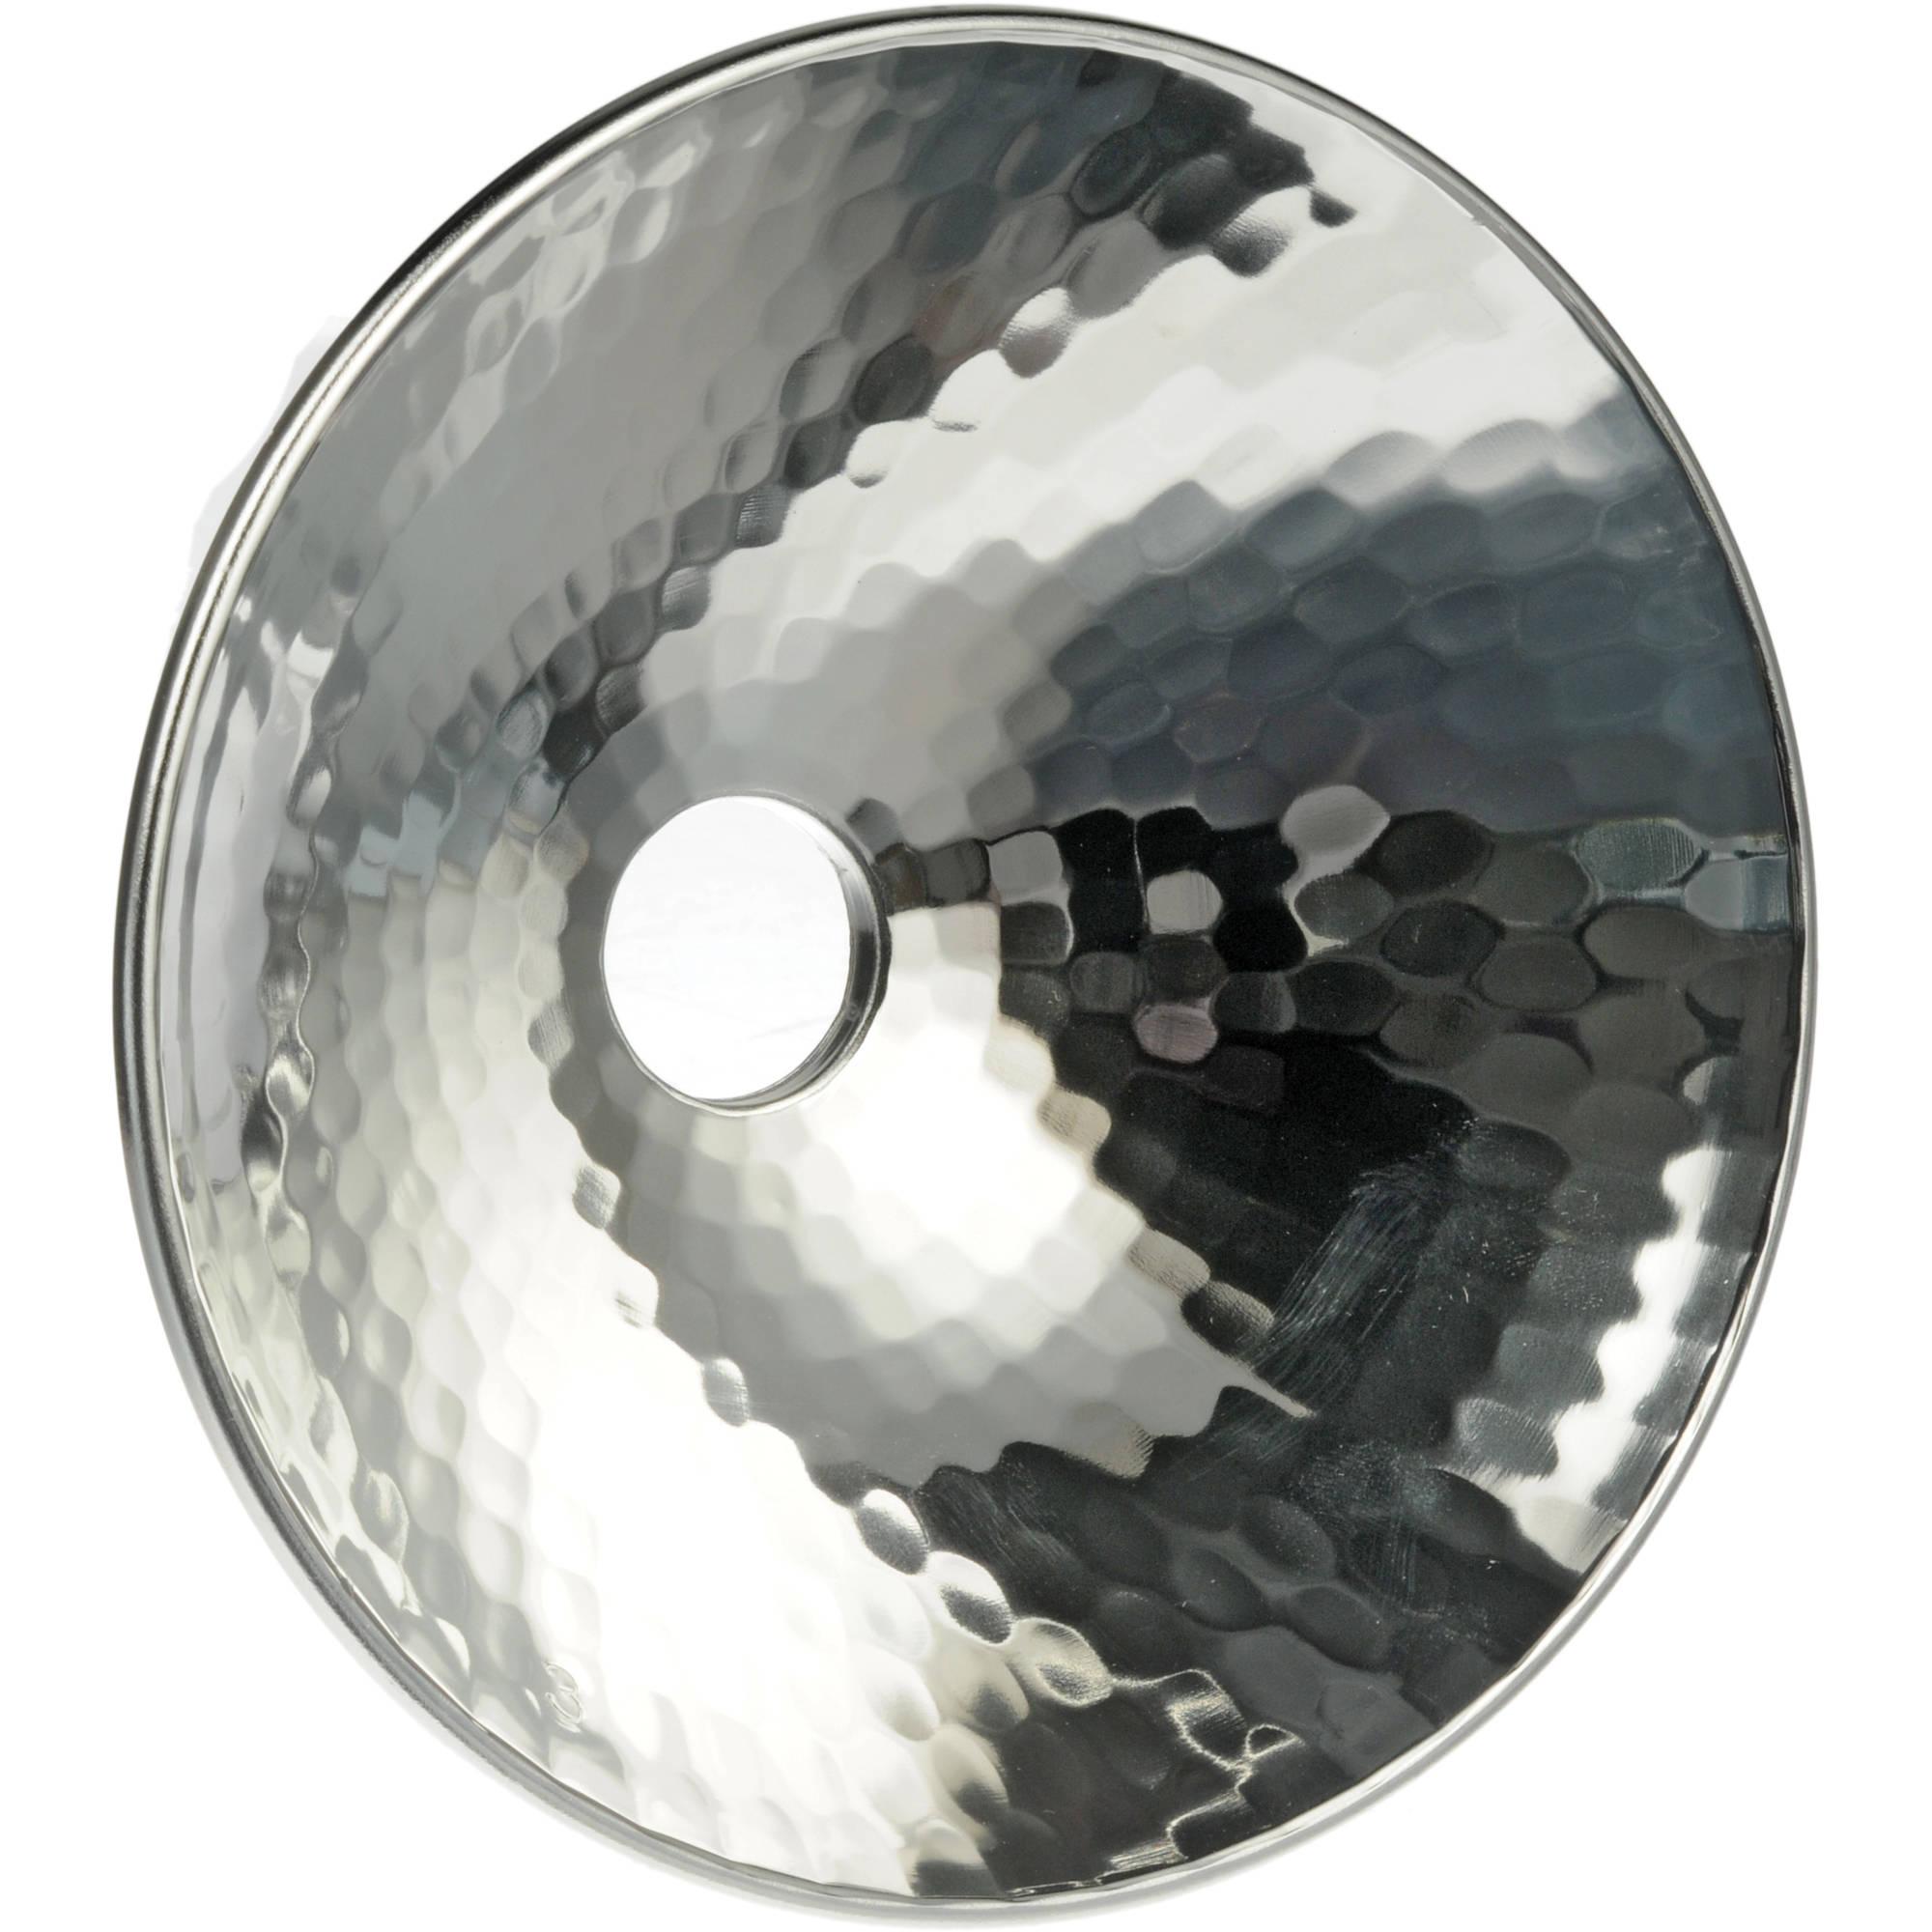 Lowel #3 Super-Spot Narrow Beam Reflector for DP Light